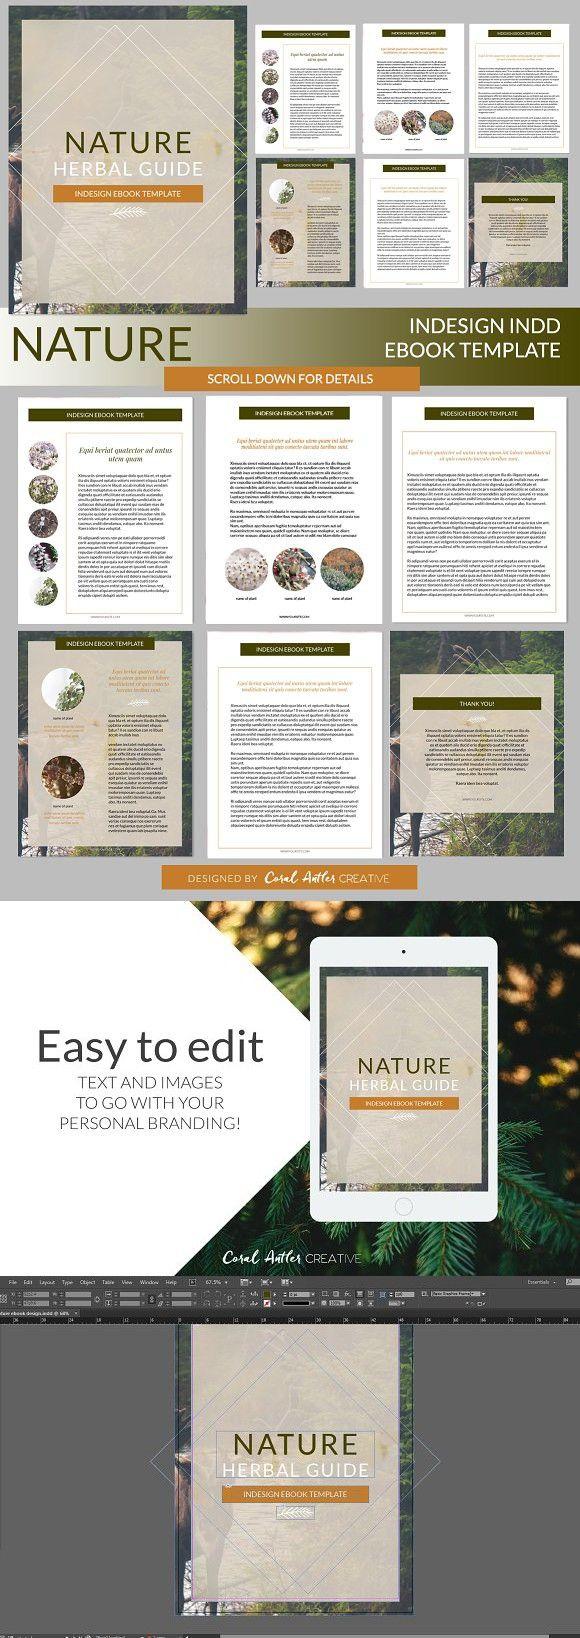 Nature indesign ebook template creative business card templates nature indesign ebook template creative business card templates cheaphphosting Gallery